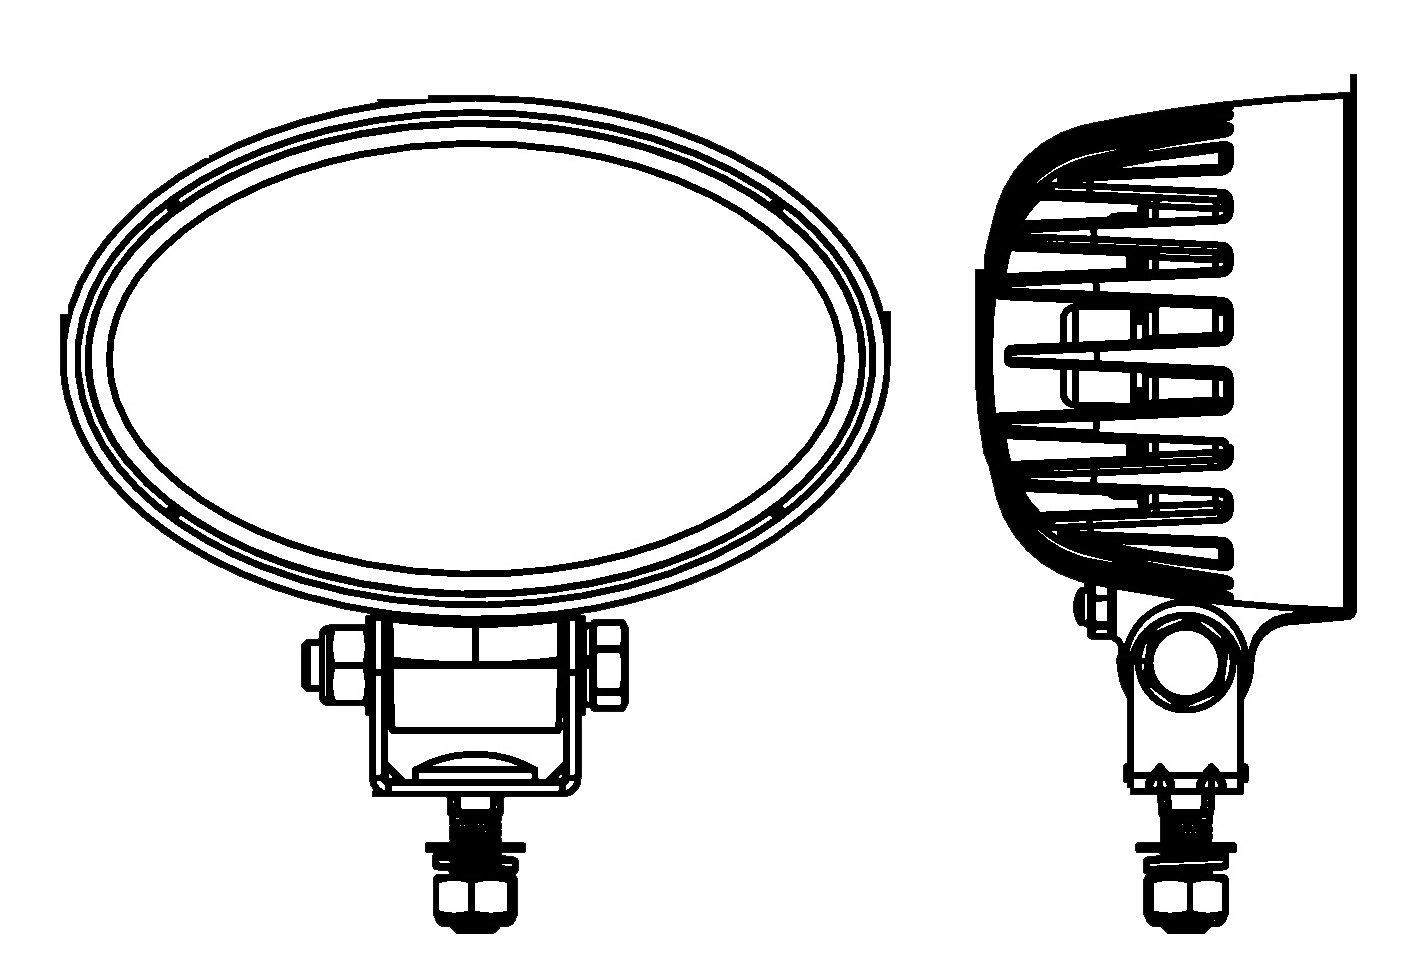 HELLA 1GA 357 001-001 Arbeitsscheinwerfer HELLA VALUEFIT für Nahfeldausleuchtung, Anbau, oval, LED, 12V/24V Hella KGaA Hueck & Co.